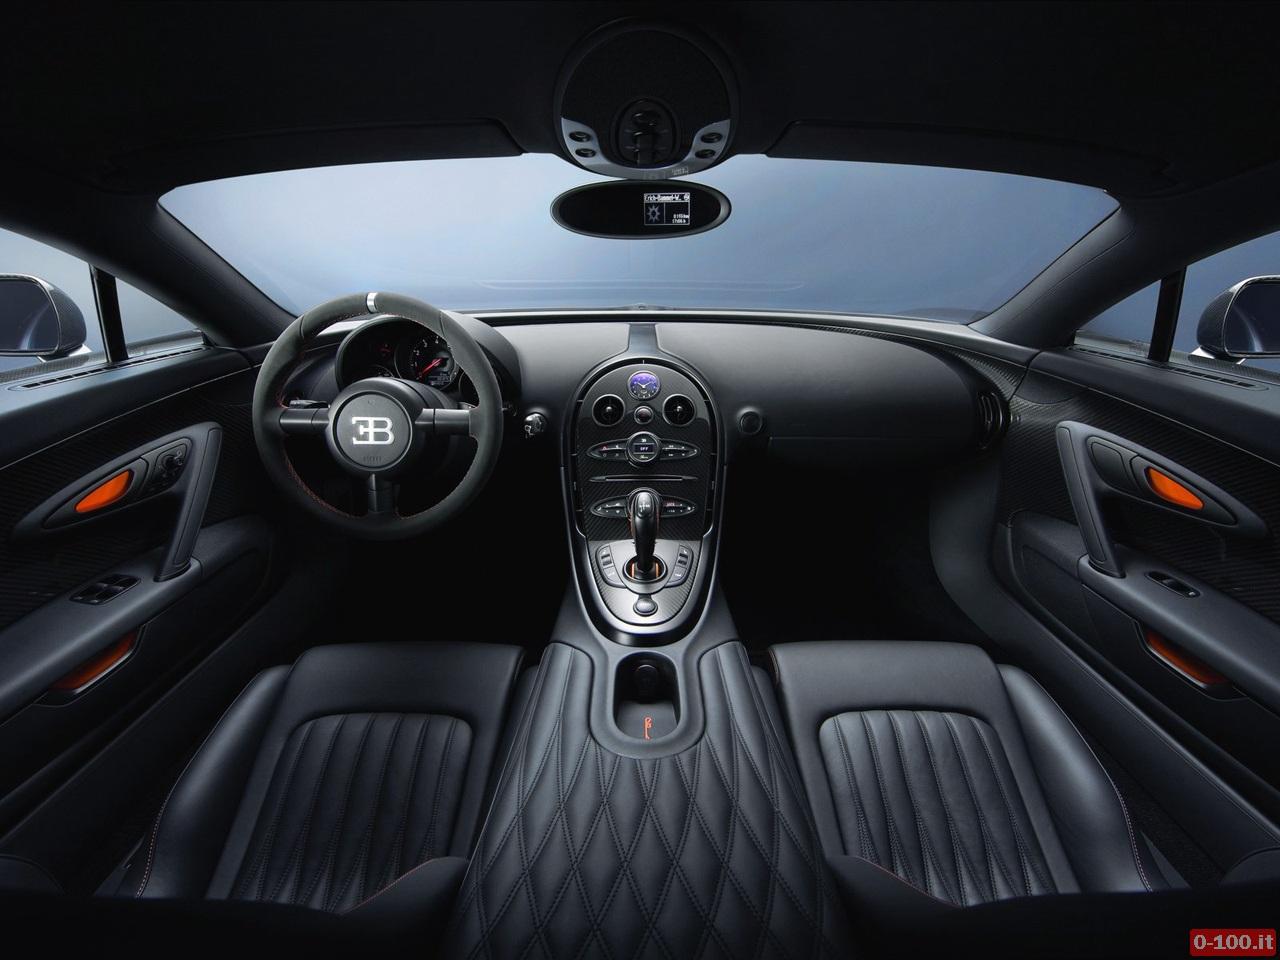 bugatti-veyron-supersport-guinness-world-records_0-100_13